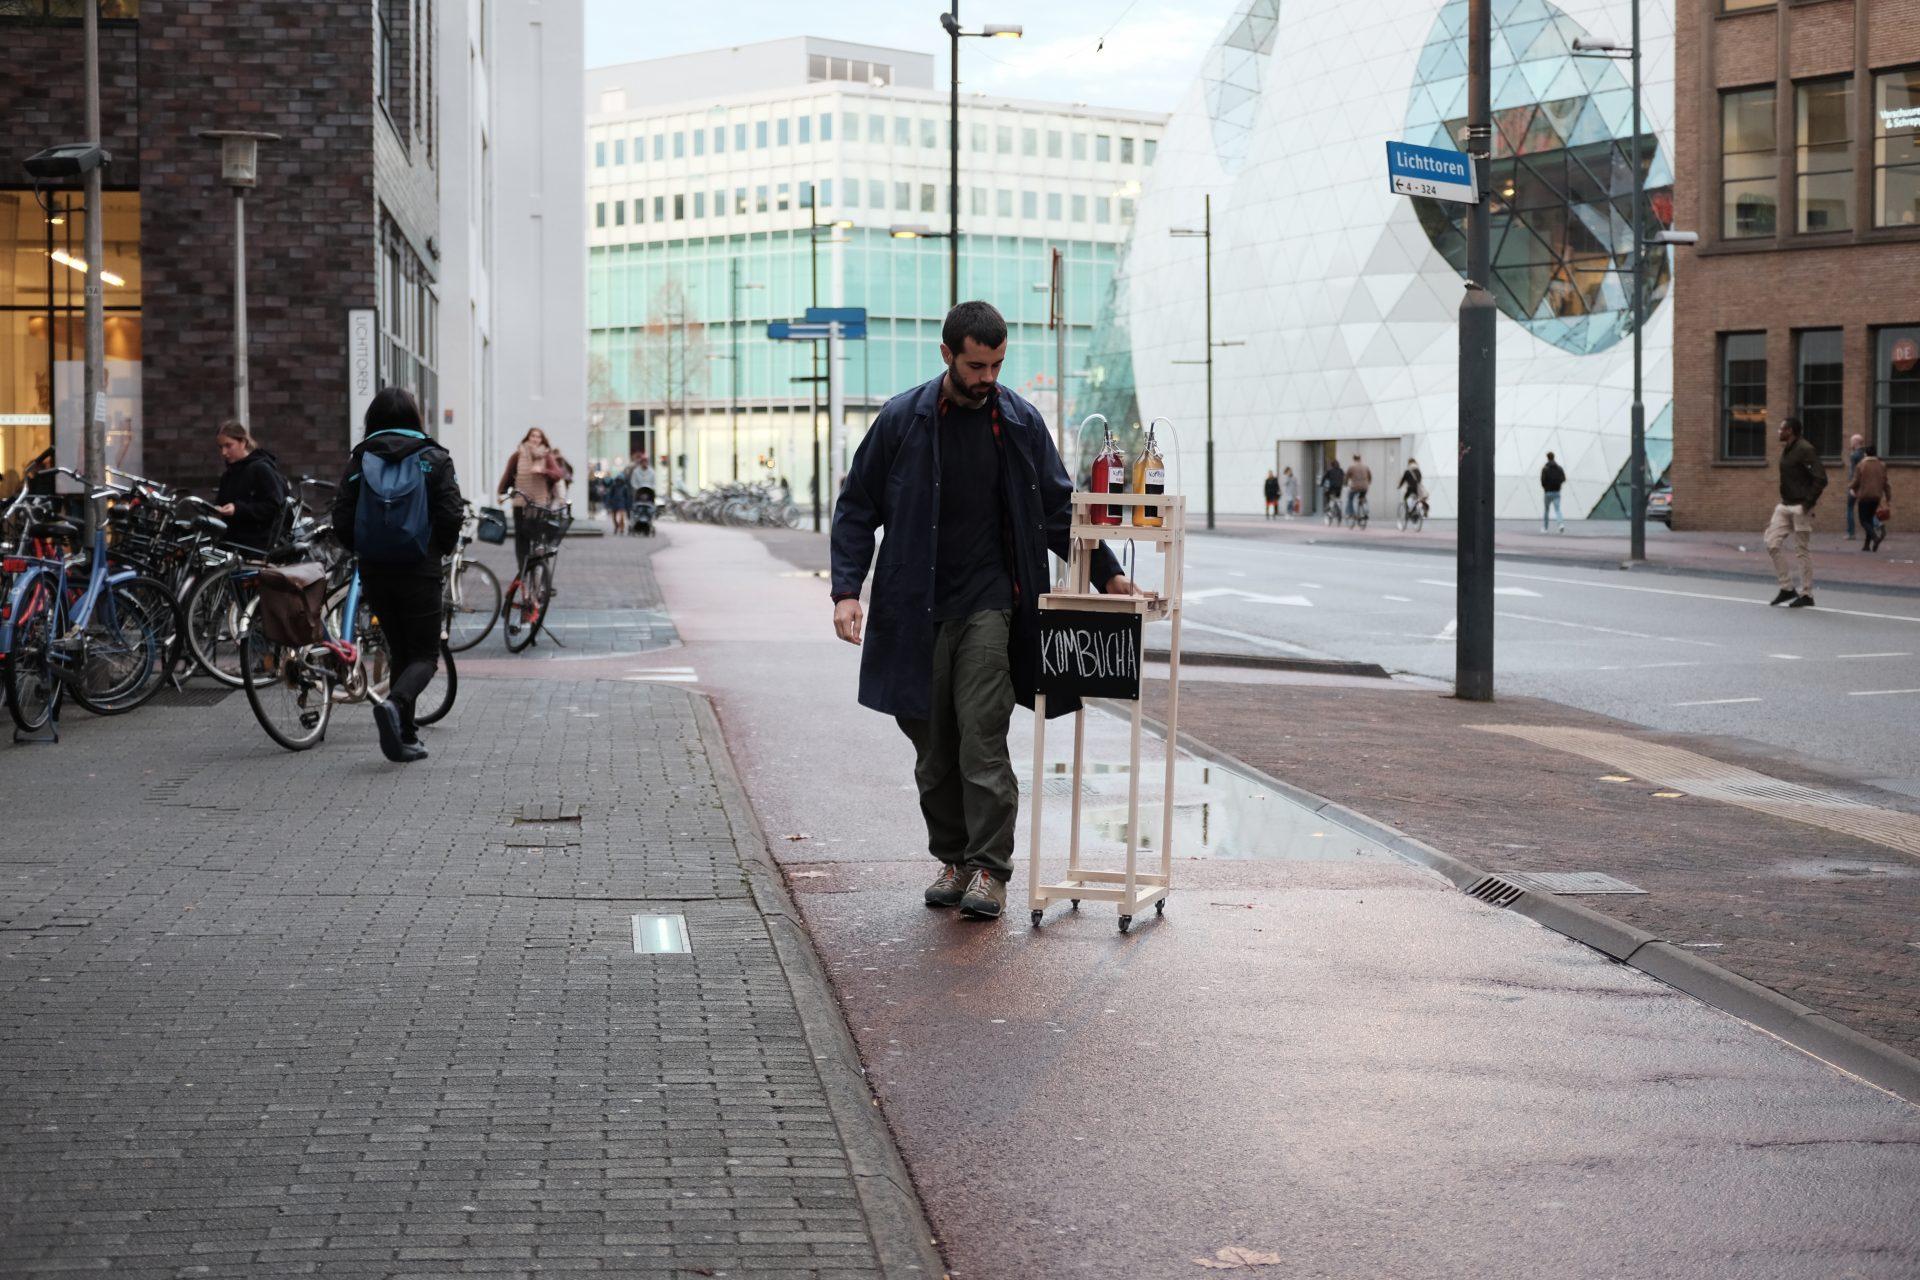 Kombucha Tapping Prototype on sidewalk